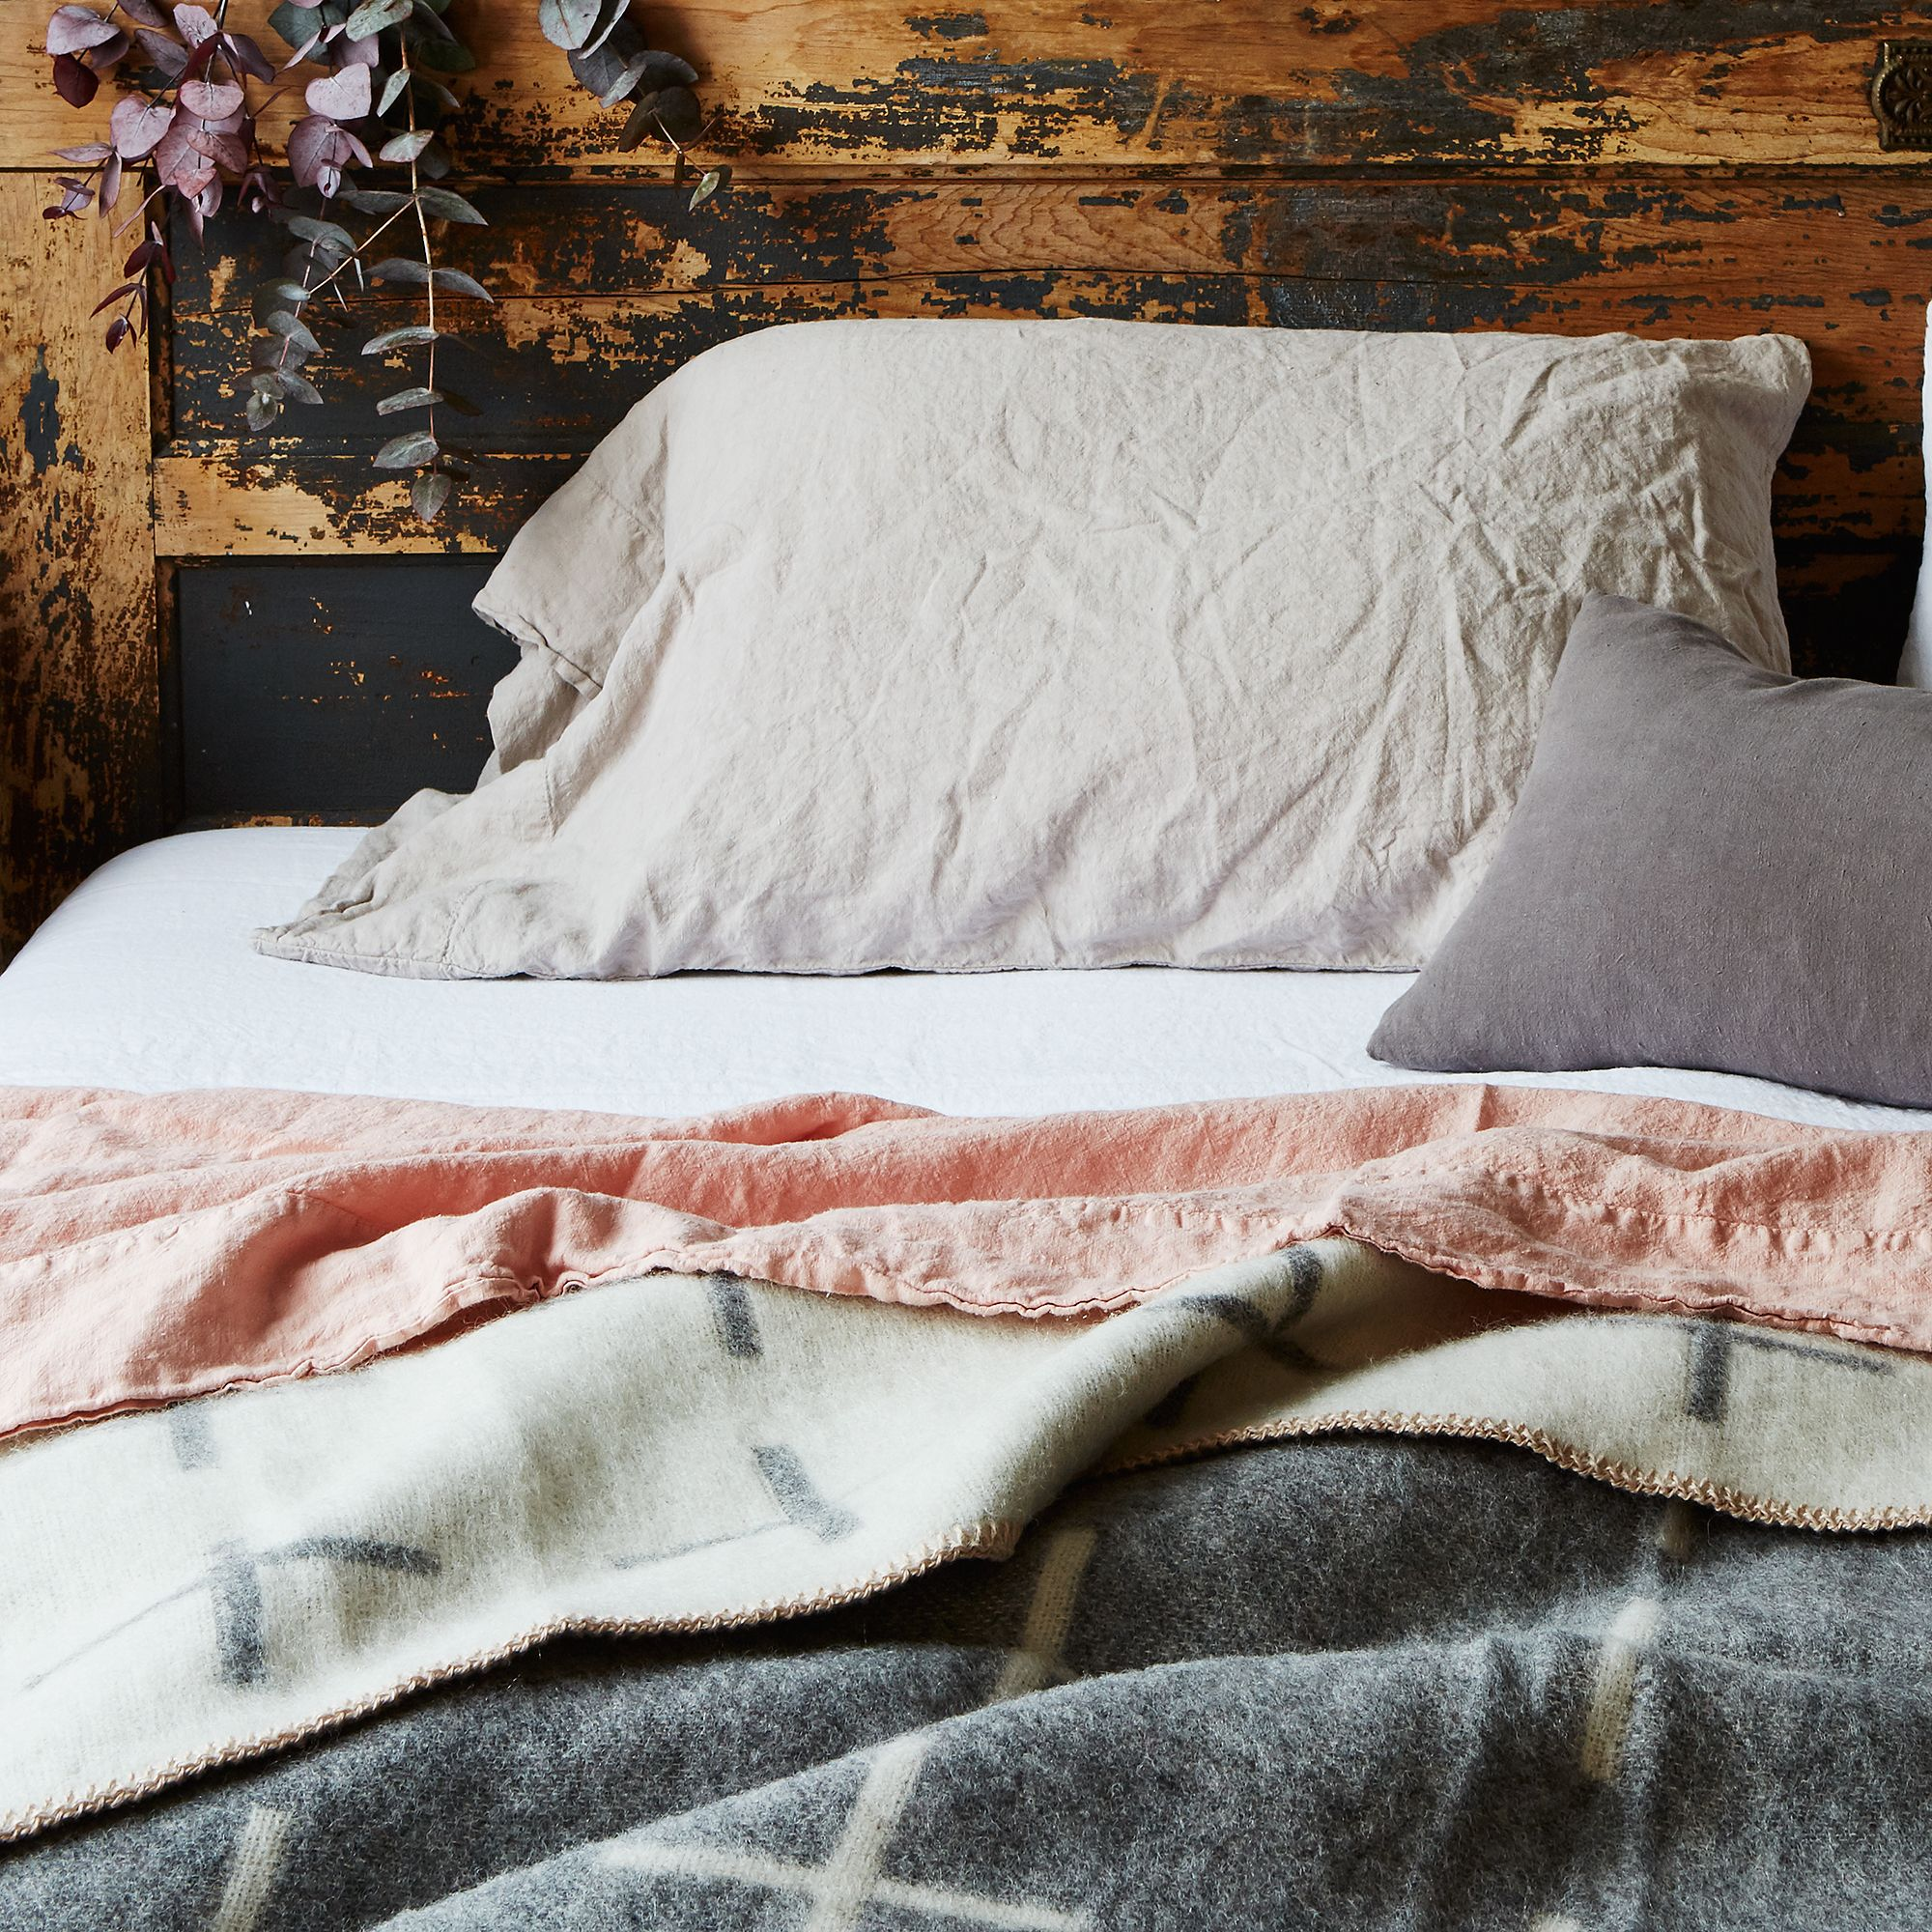 crochet cable knit size comforter ikea pattern blanket queen info museosdemolina